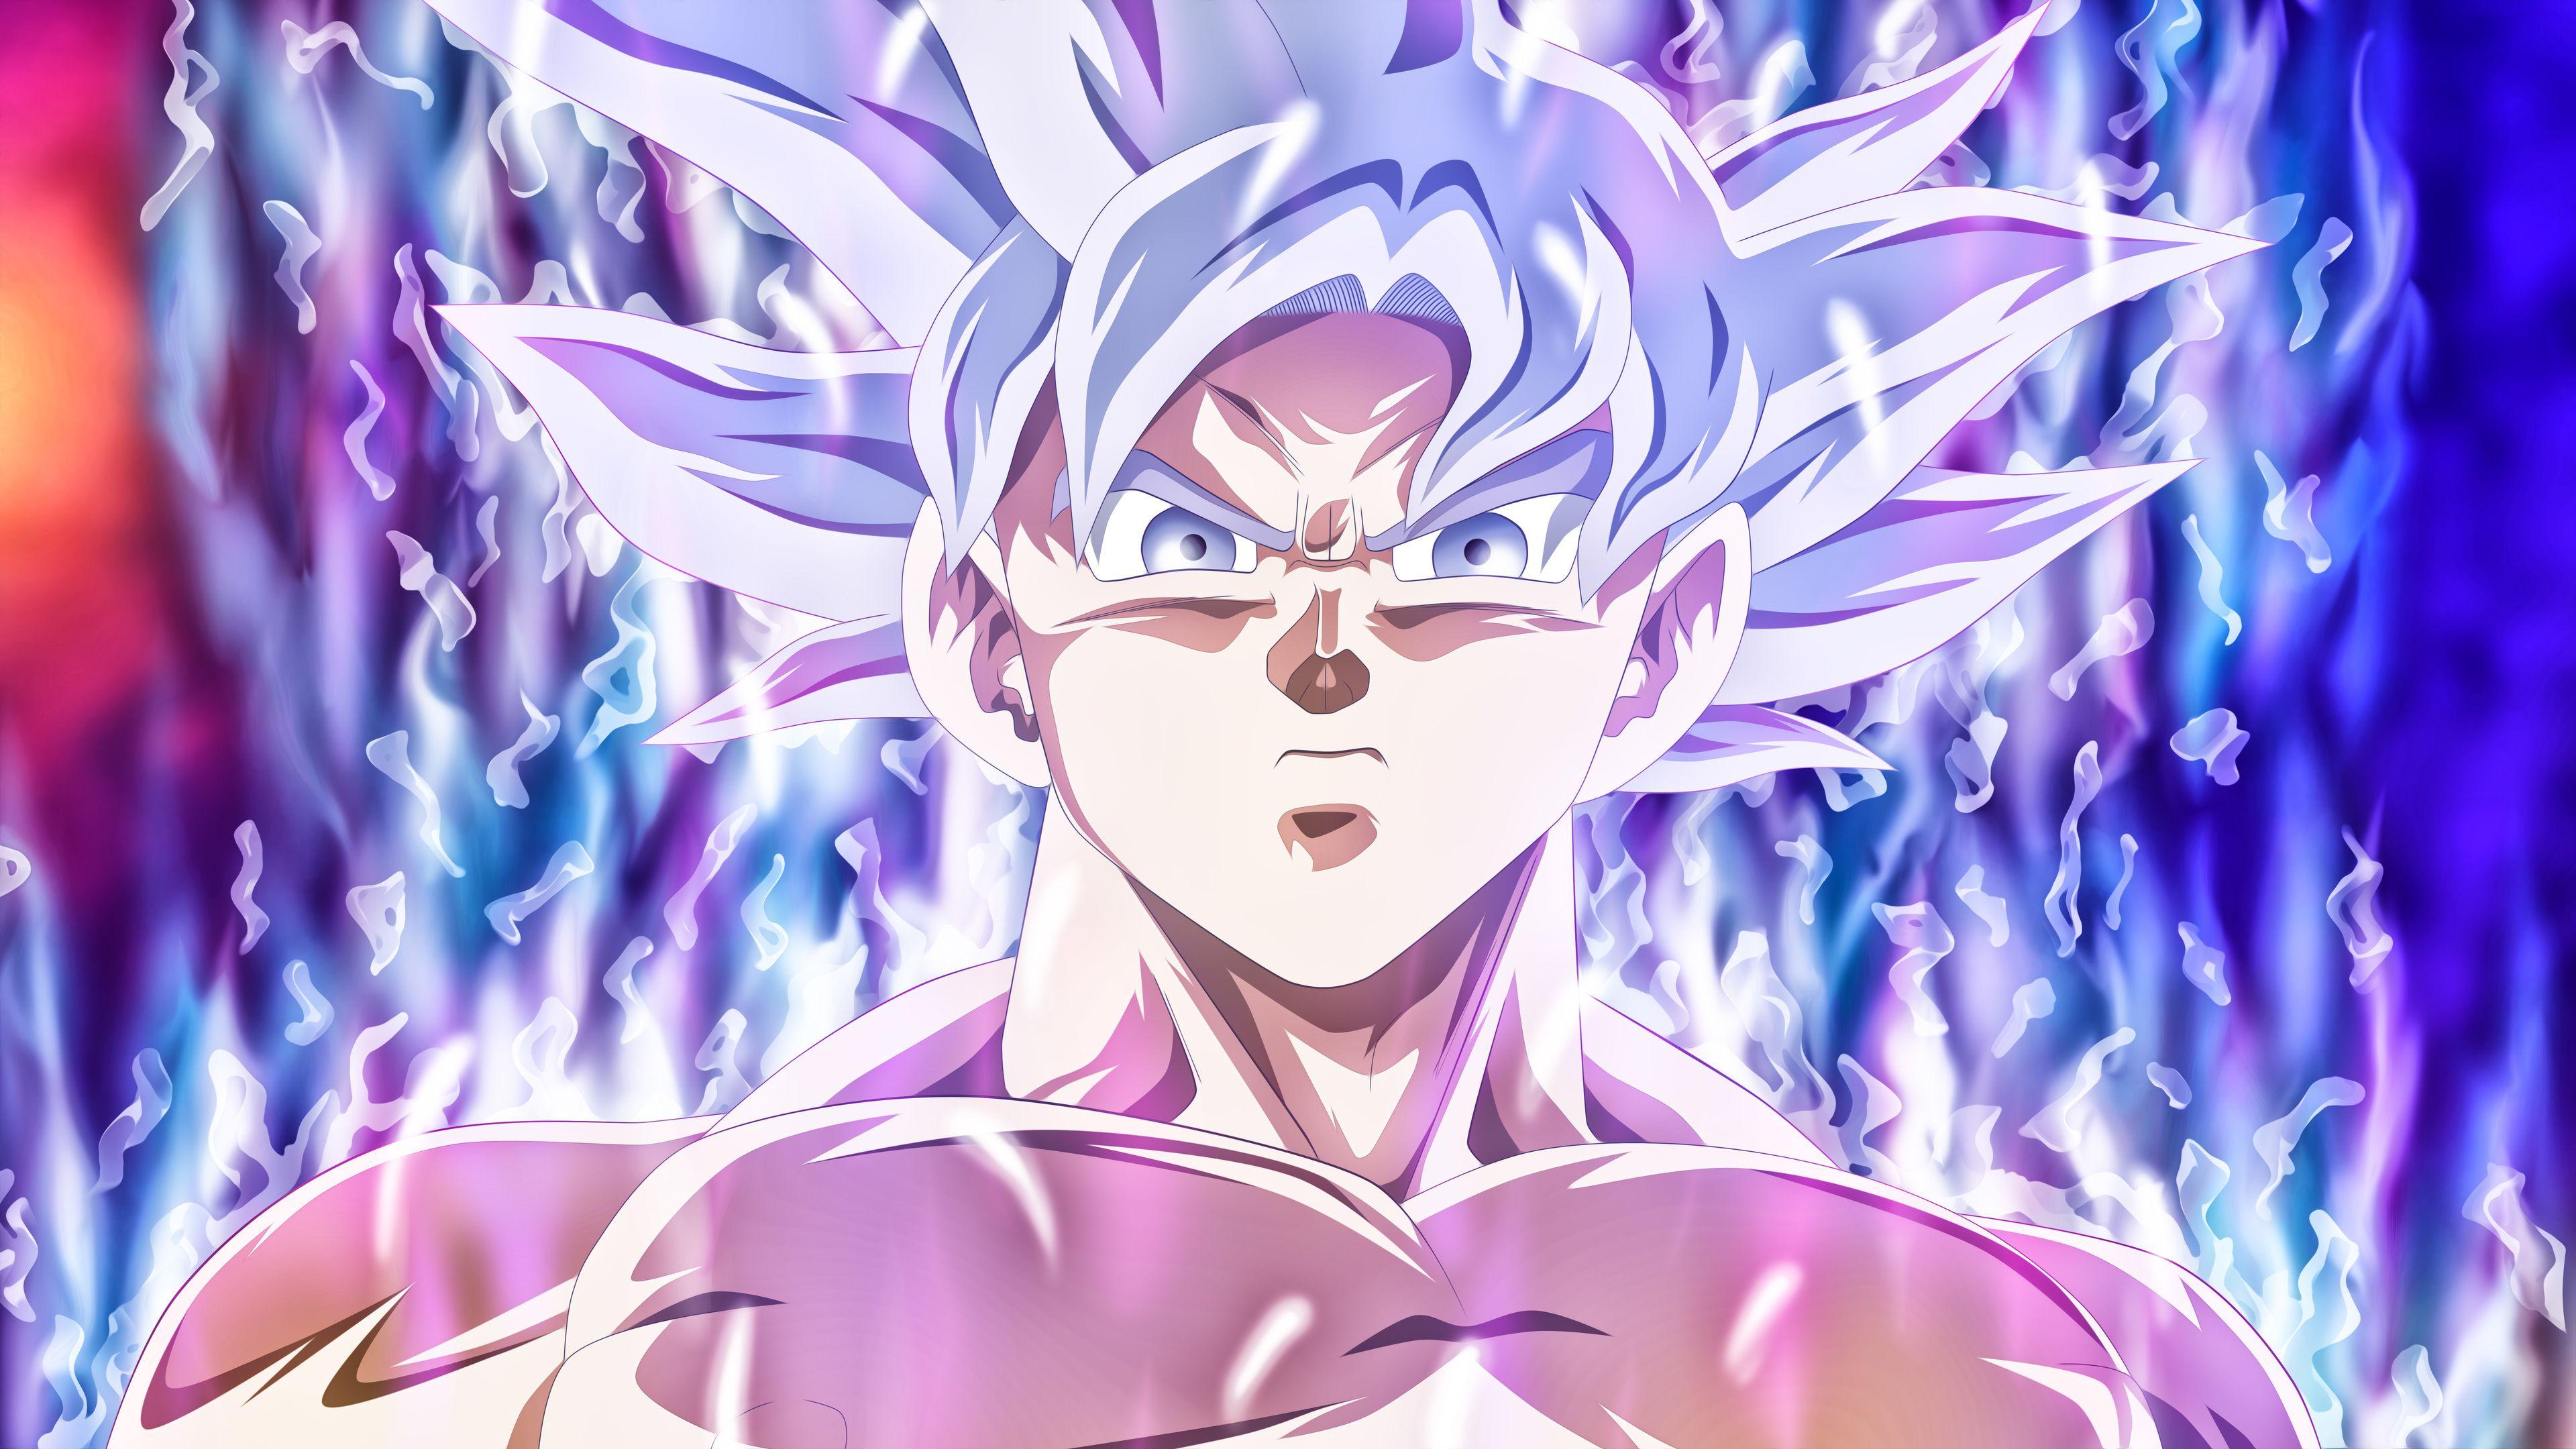 Goku Mastered Ultra Instinct Hd Wallpapers Goku Wallpapers Dragon Ball Wallpapers Dragon Dragon Ball Super Wallpapers Goku Wallpaper Dragon Ball Wallpapers